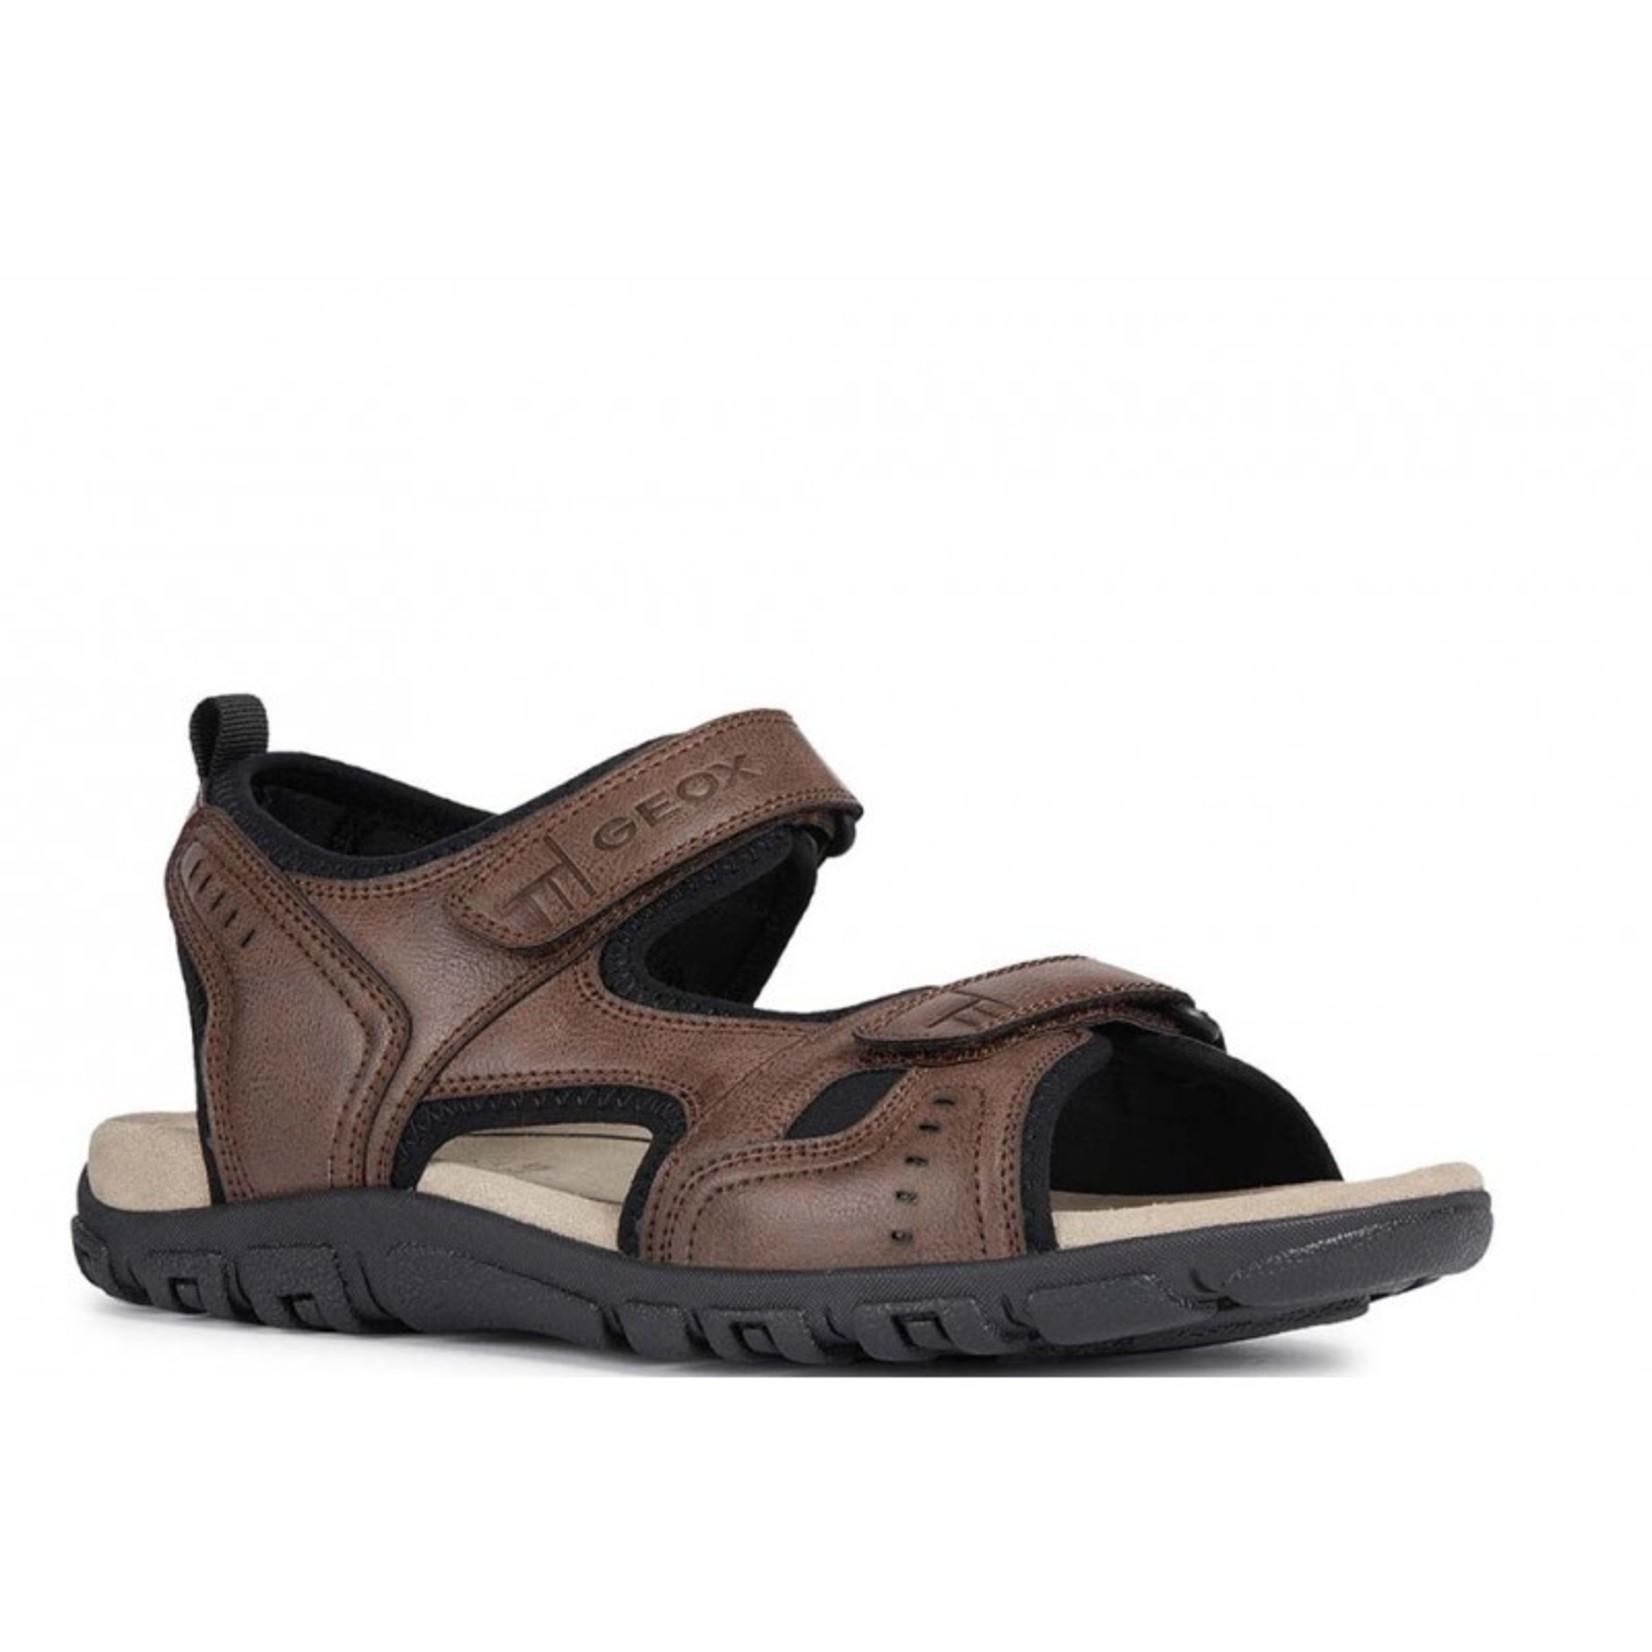 GEOX Geox - Sandale homme - U4224A